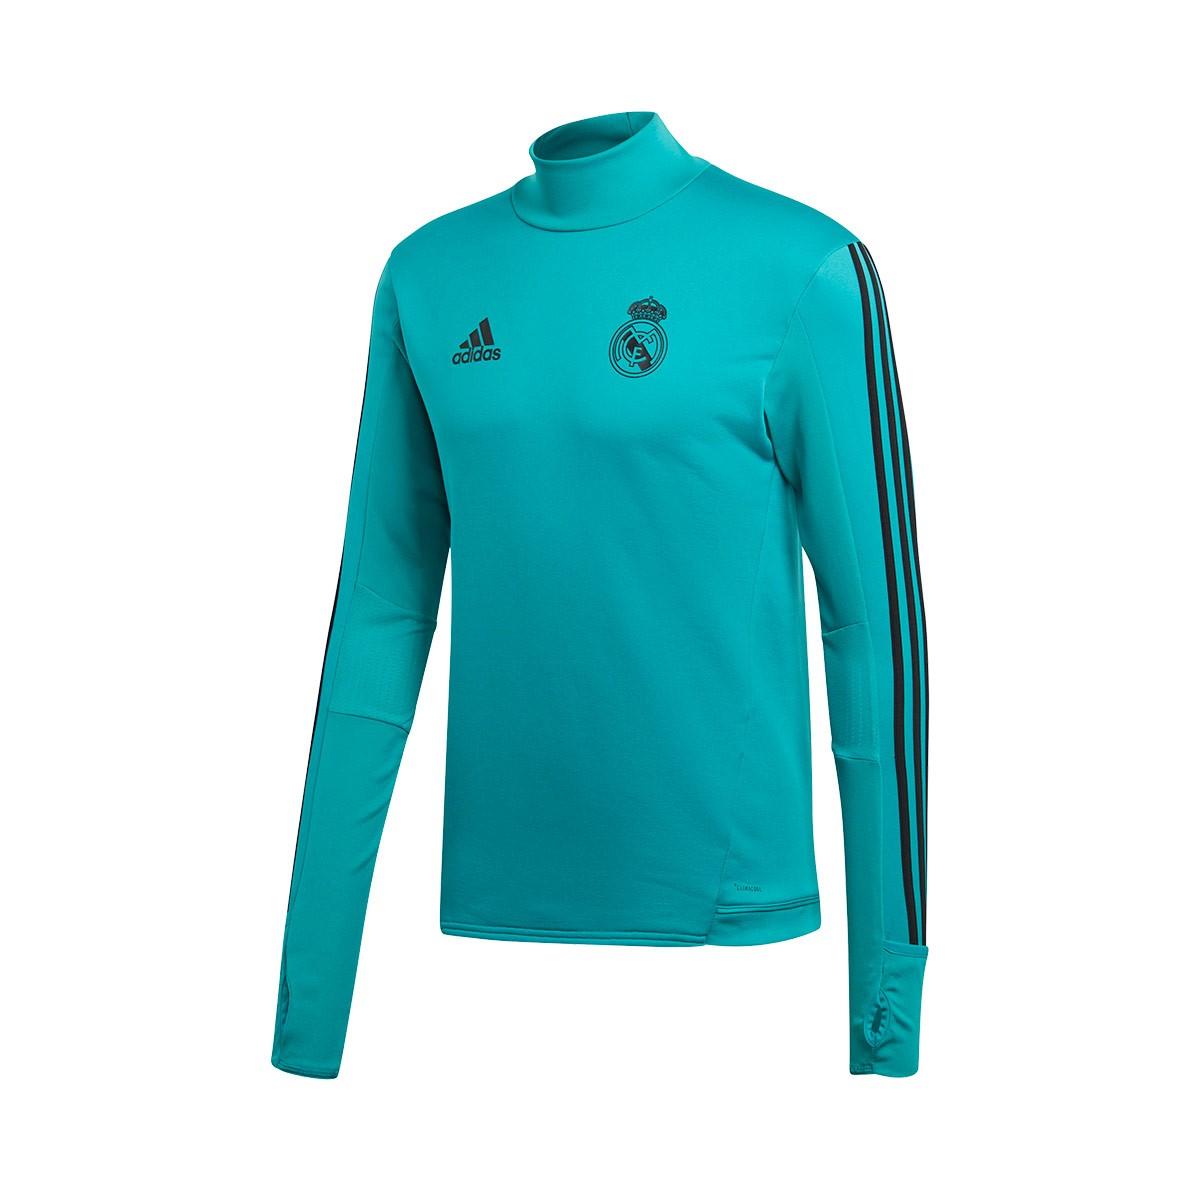 new arrival 9dab8 42a4a Camiseta Real Madrid Training Top 2017-2018 Aero reef-Black